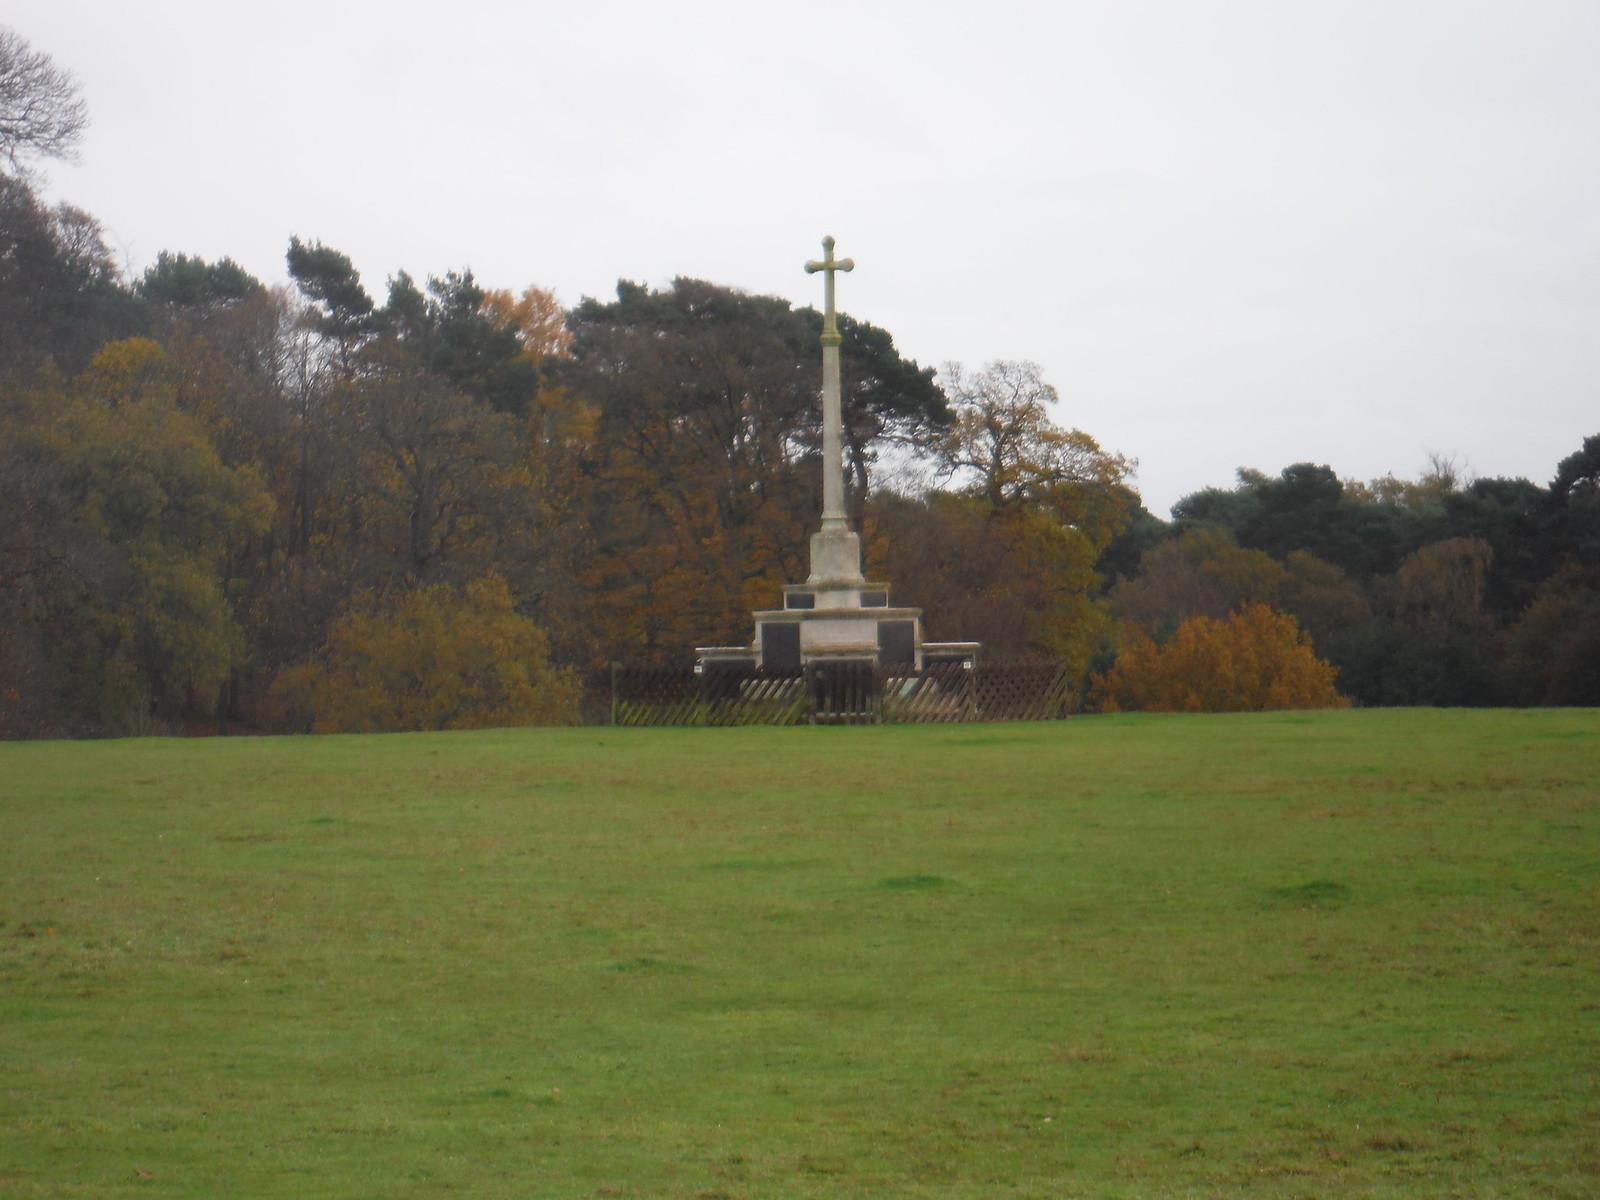 Ampthill Camp Memorial Cross SWC Walk 232 Lidlington to Flitwick